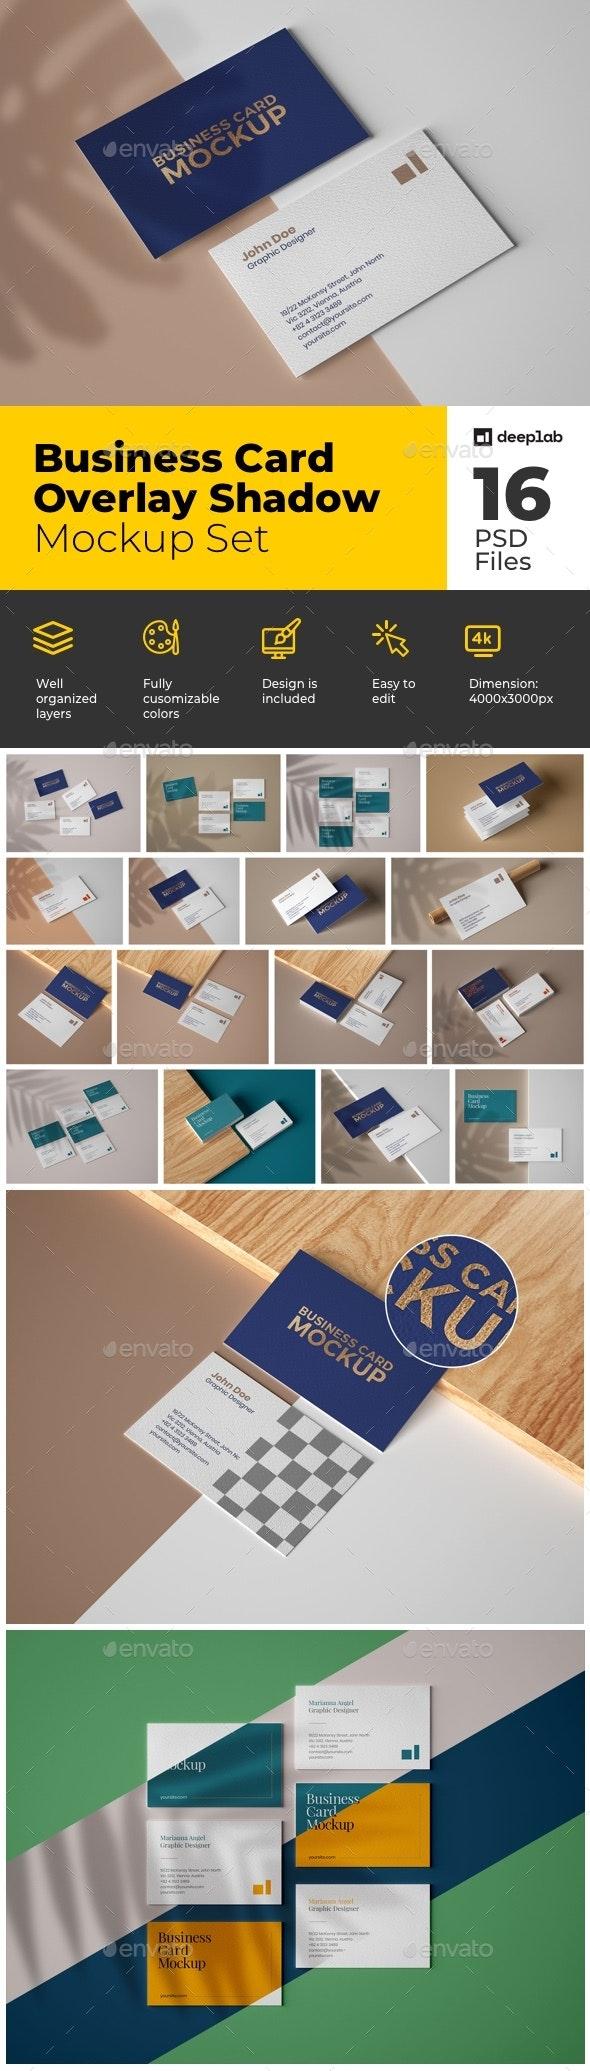 Business Card Mockup Set With Overlay Shadows - Product Mock-Ups Graphics